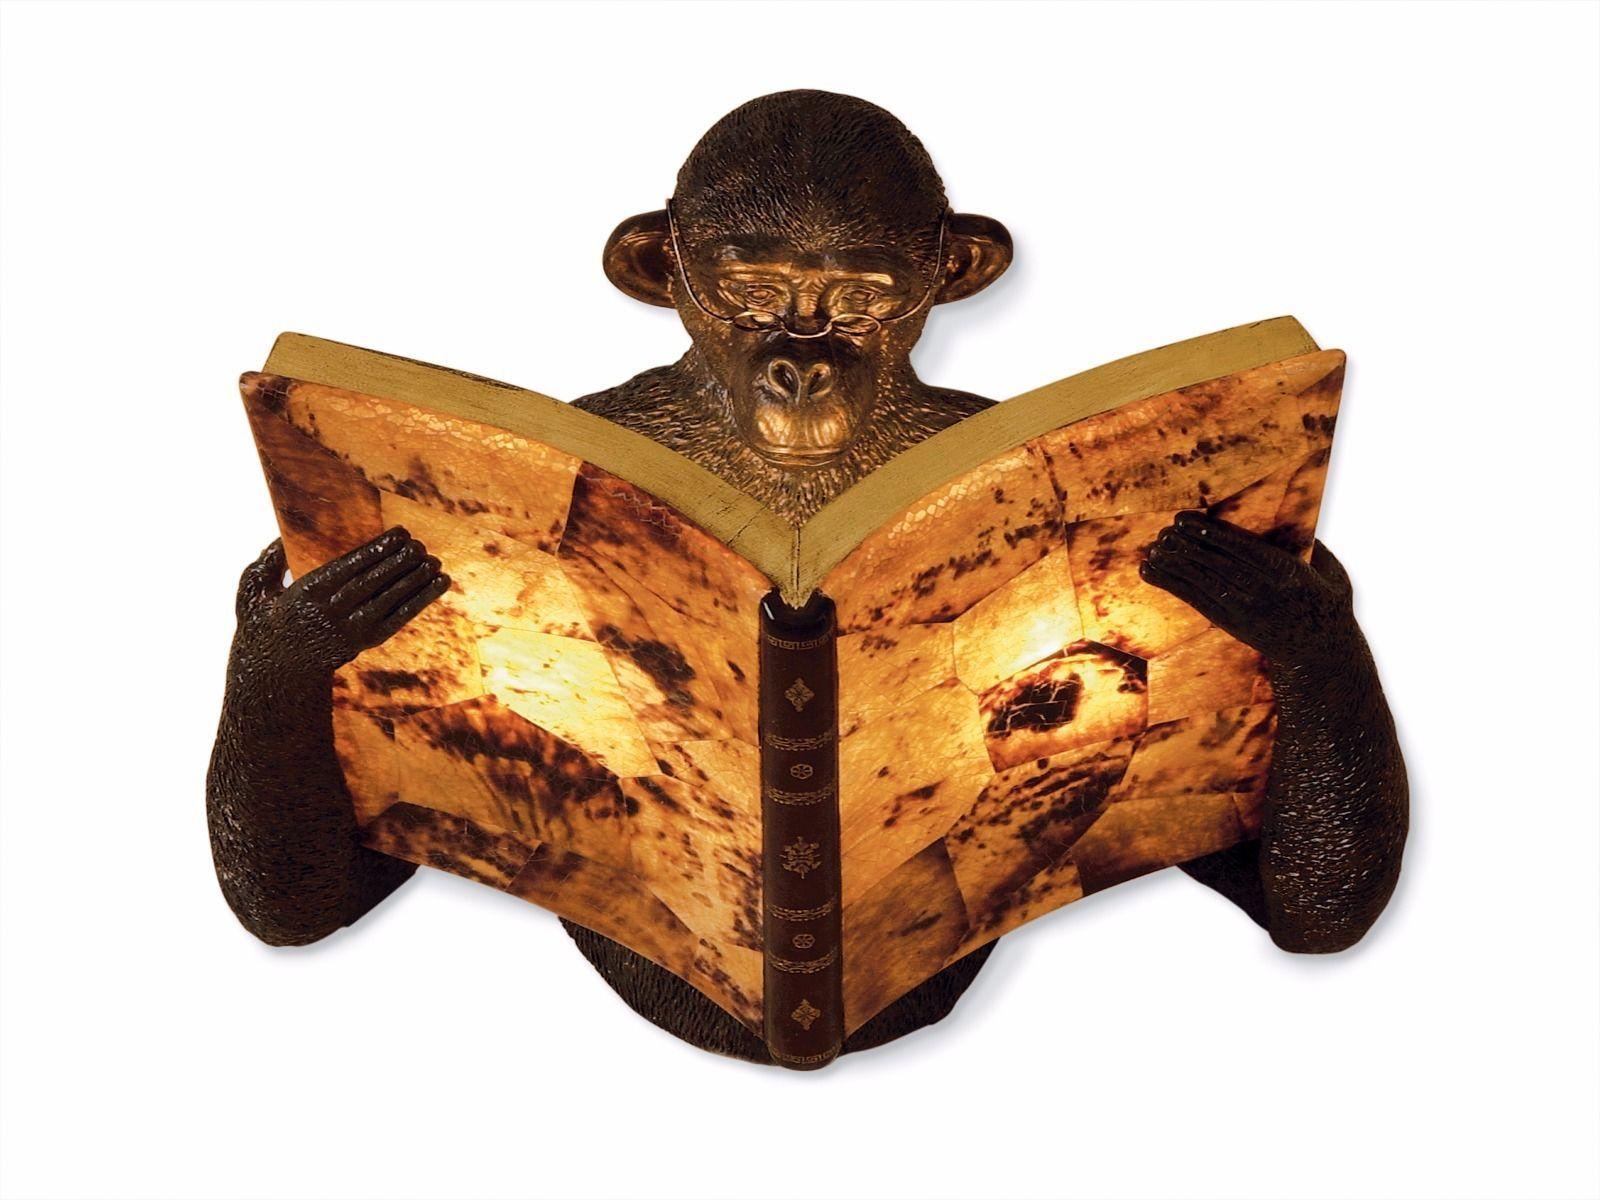 Maitland Smith 1943 130 Monkey Reading Book Wall Sconce